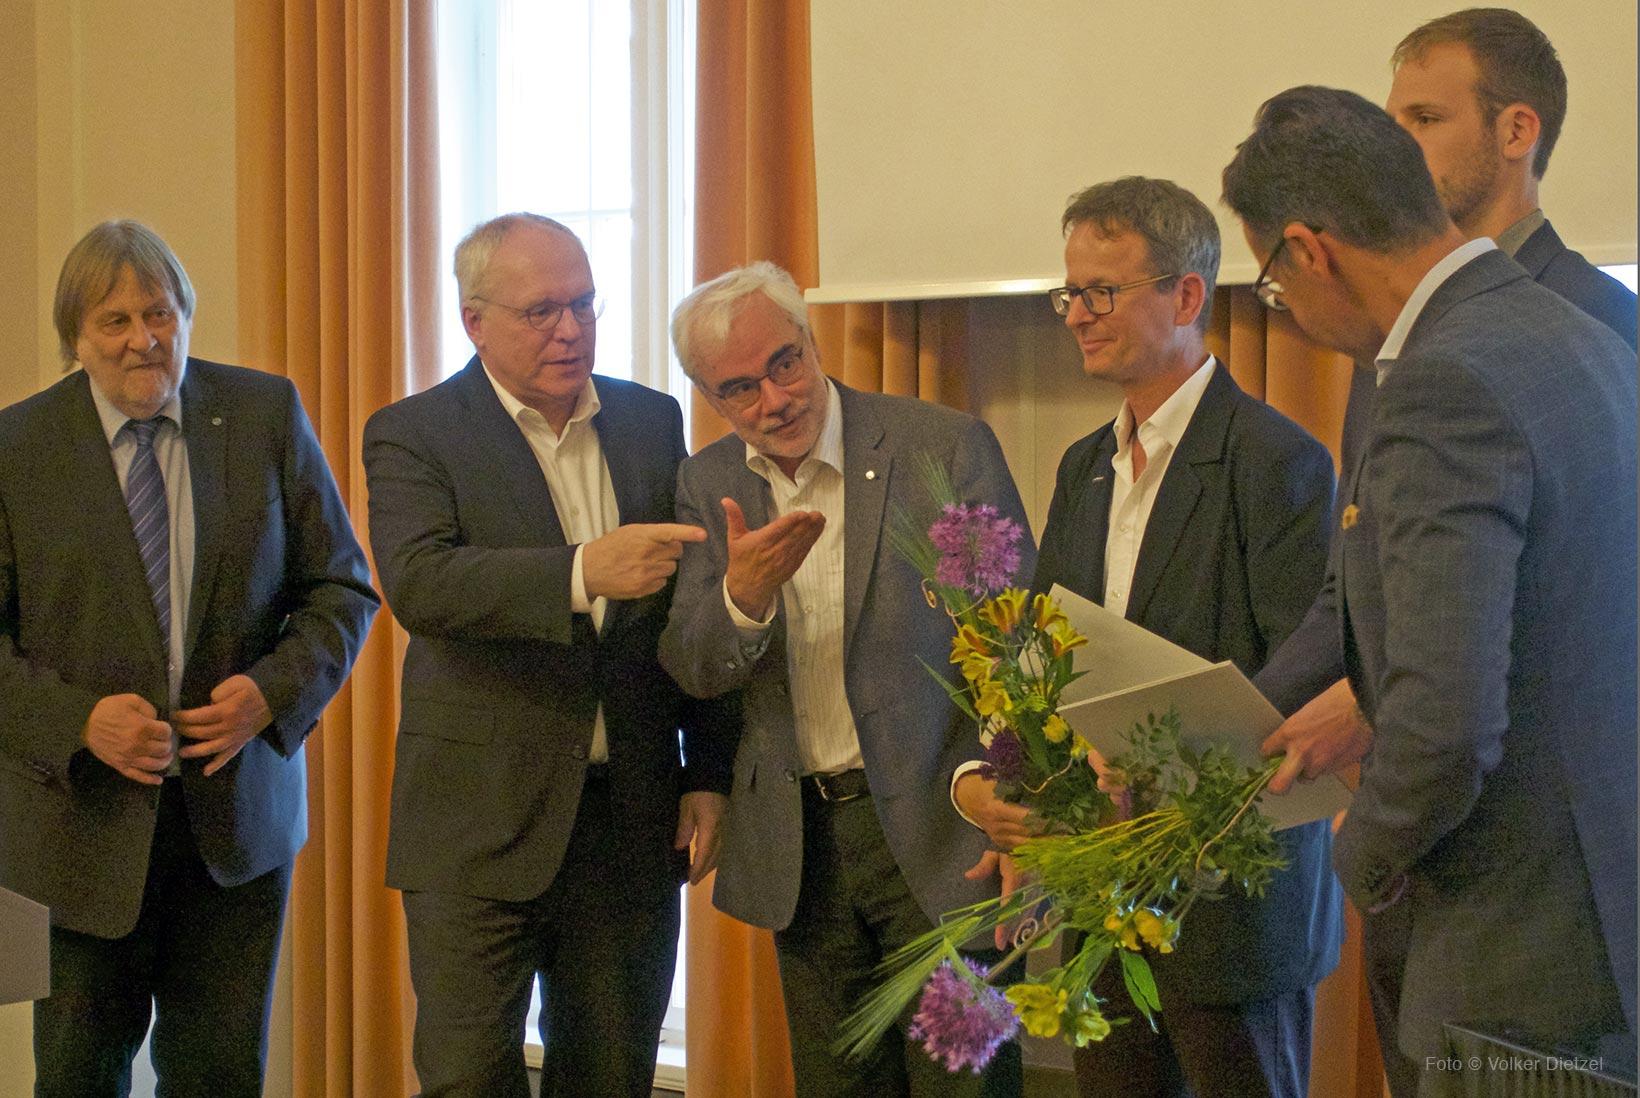 Roland Fuhrmann, Kurt-Beyer-Preis 2018